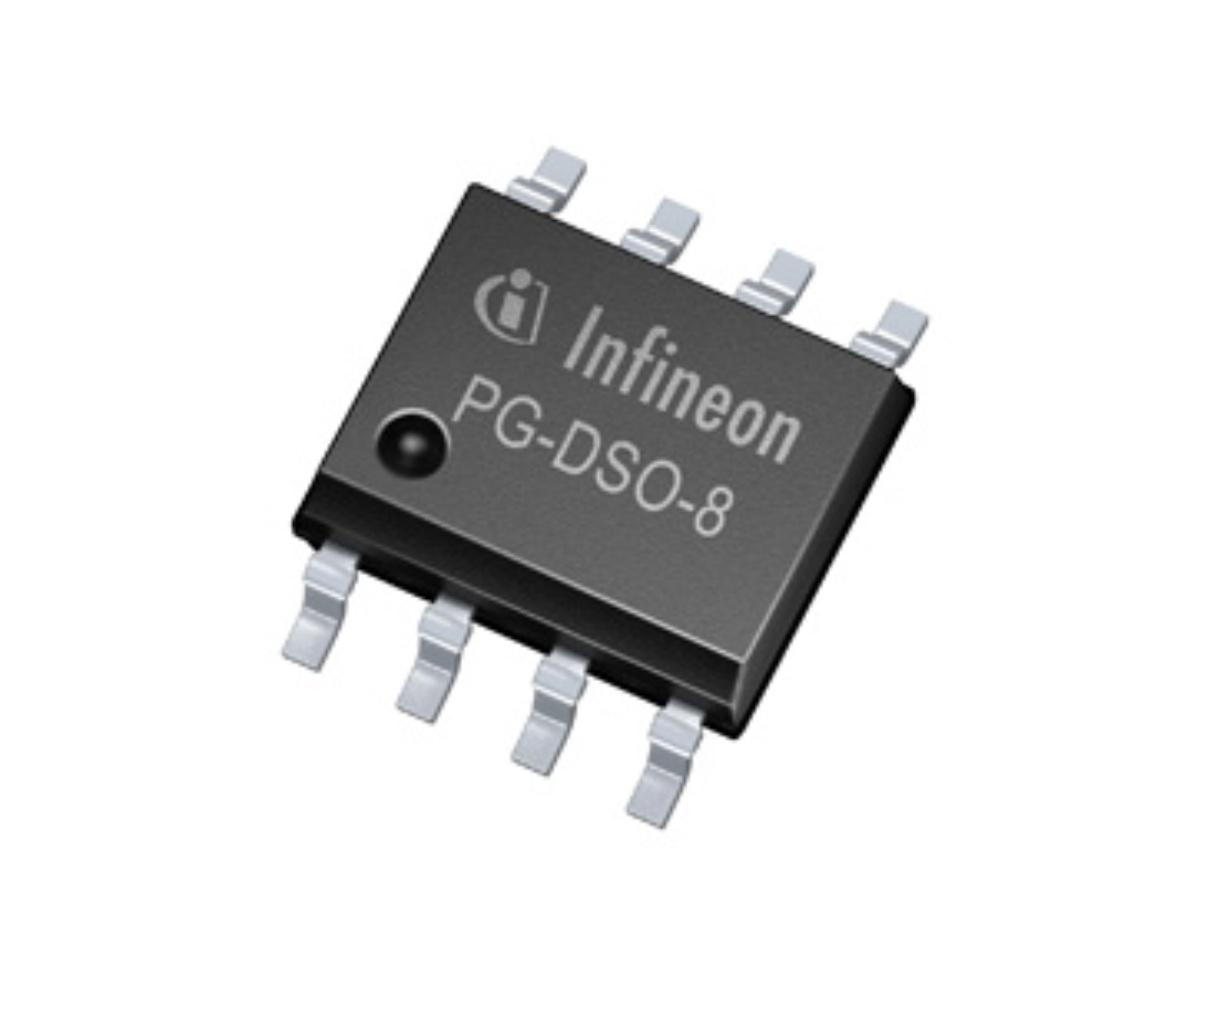 Tle4269g Infineon Technologies Solidstaterelaysanpdf 02 60 2018 11 20 Pdf 746 Kb